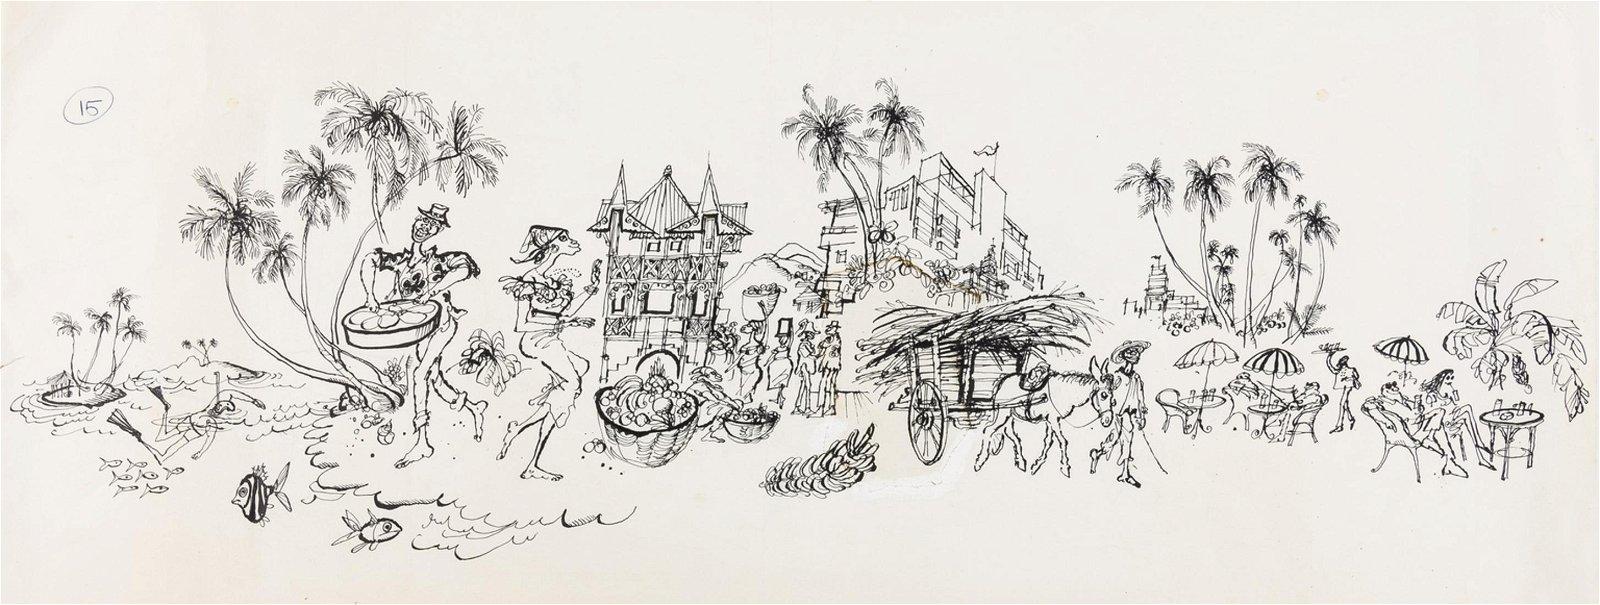 Original illustration.- Searle (Ronald) The Caribbean,